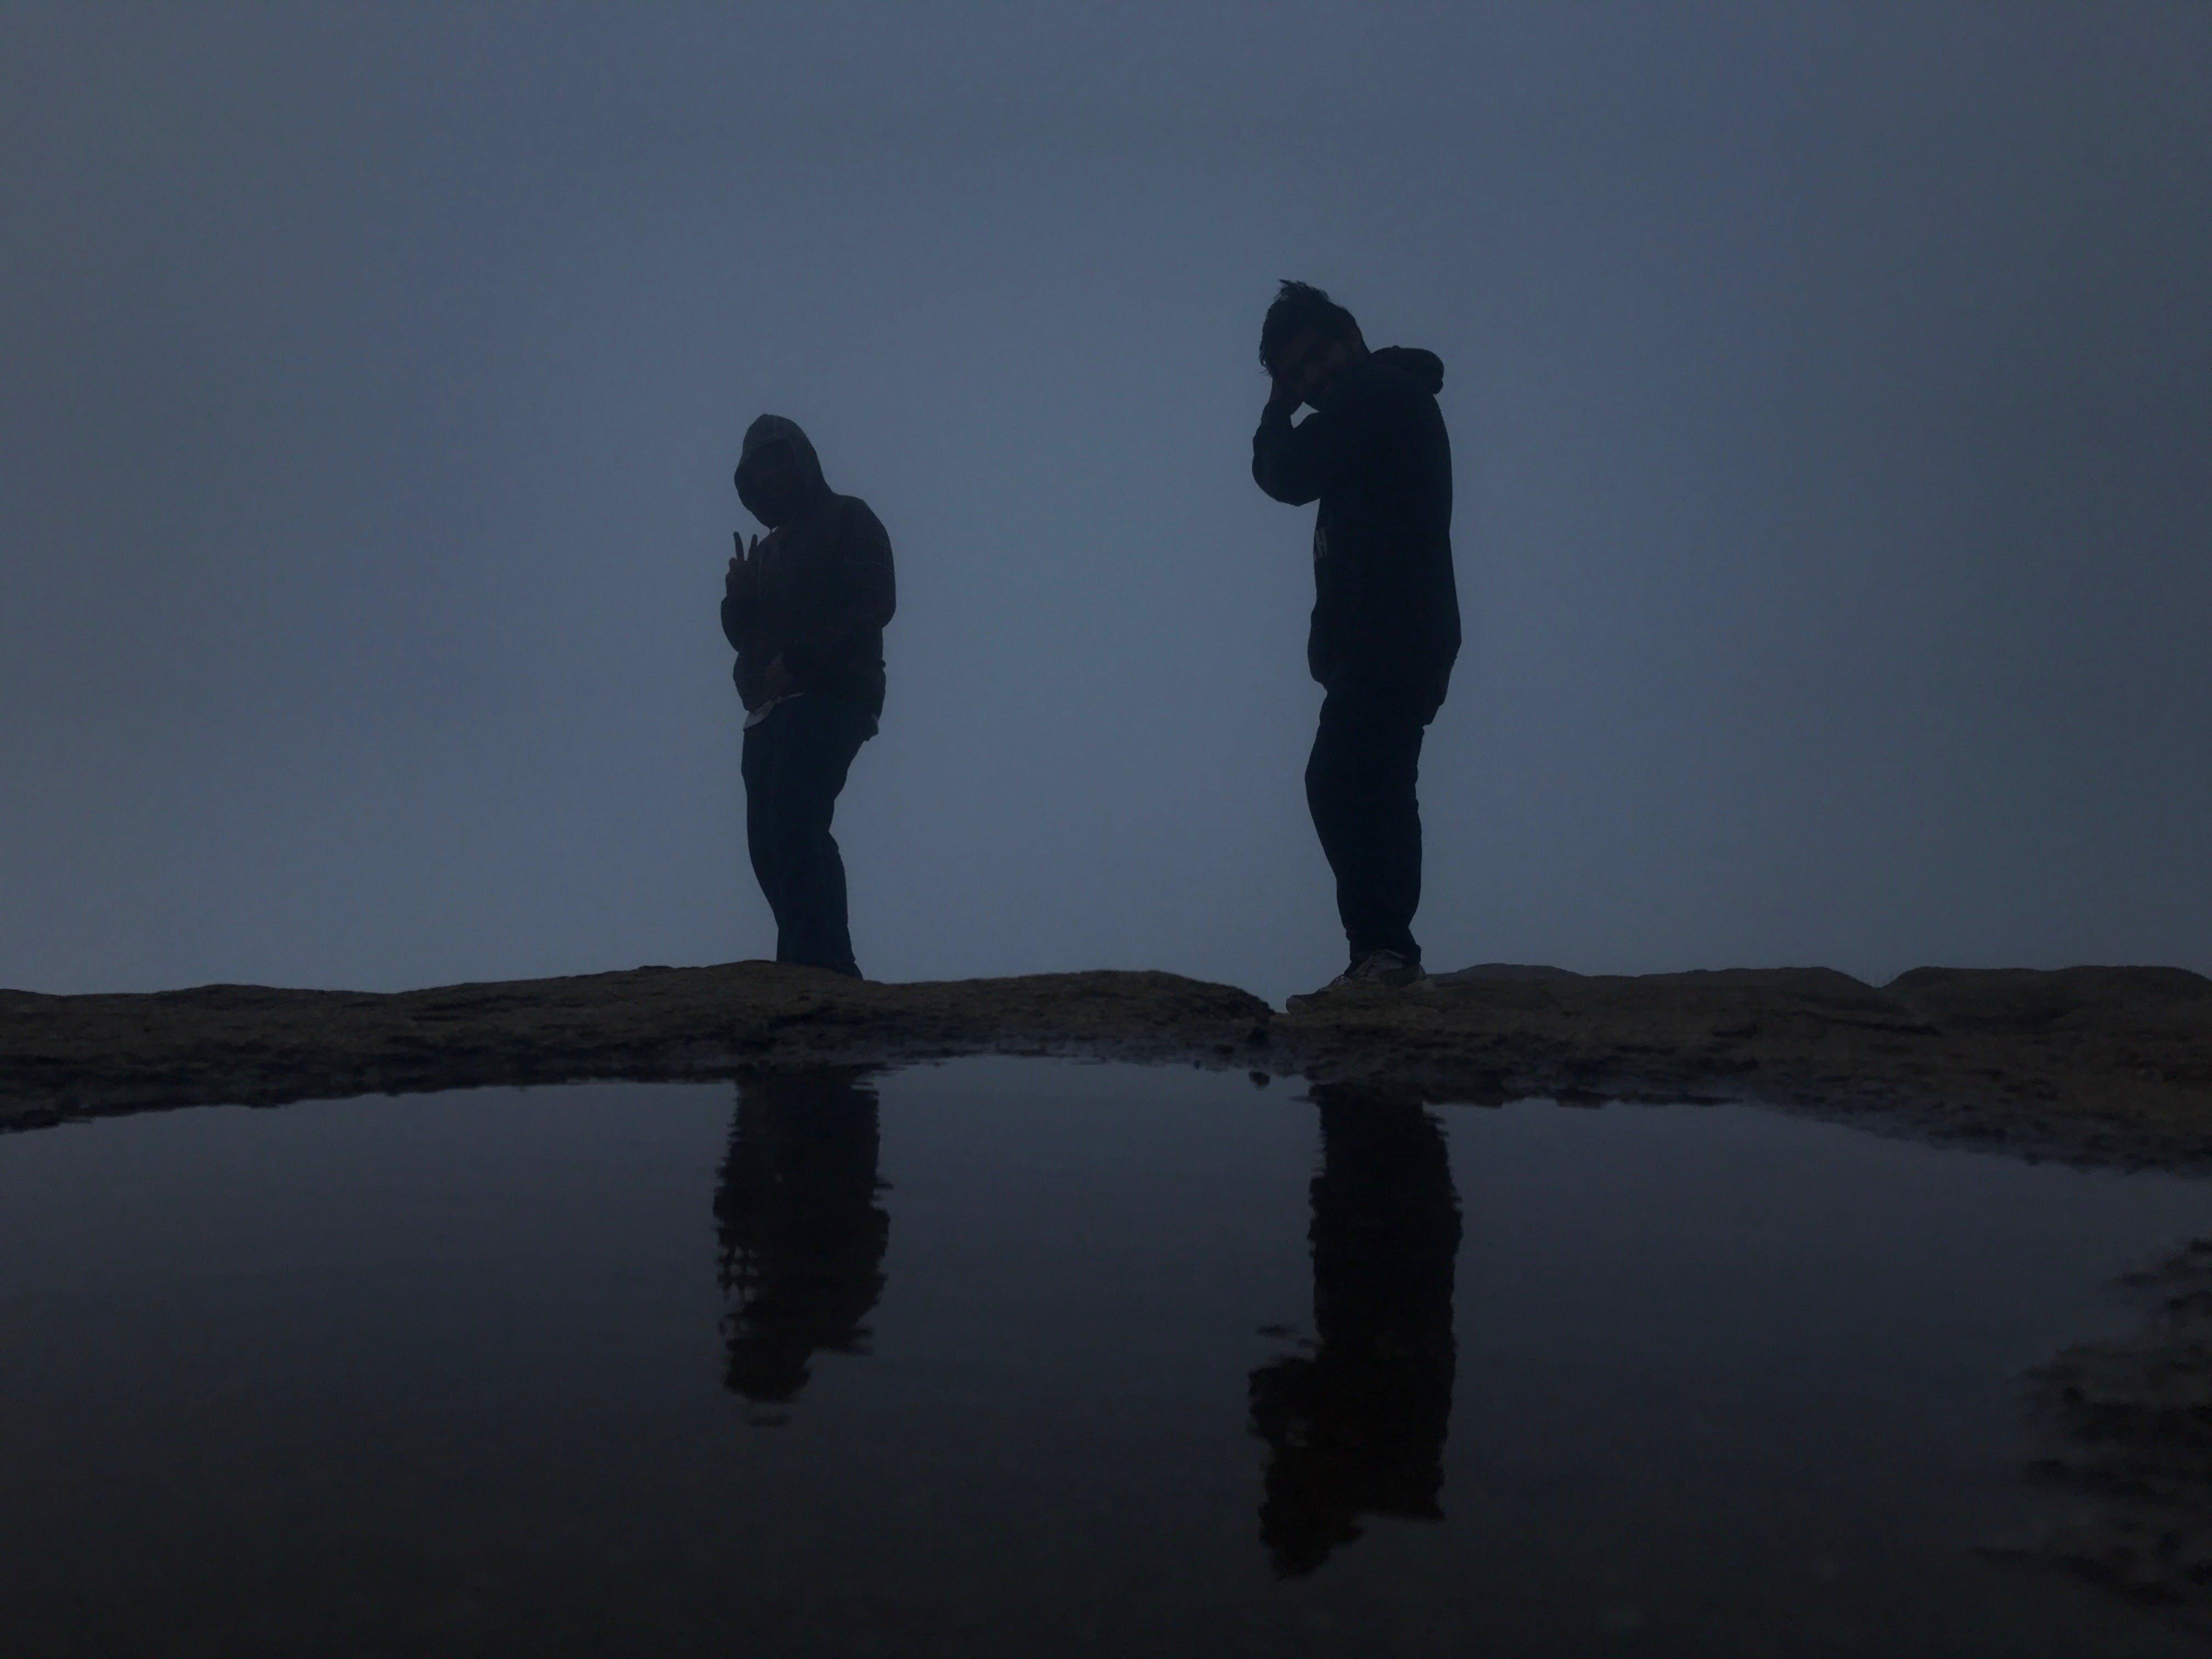 Free stock photo of #mobilechallenge, #outdoorchallenge, shades, twilight